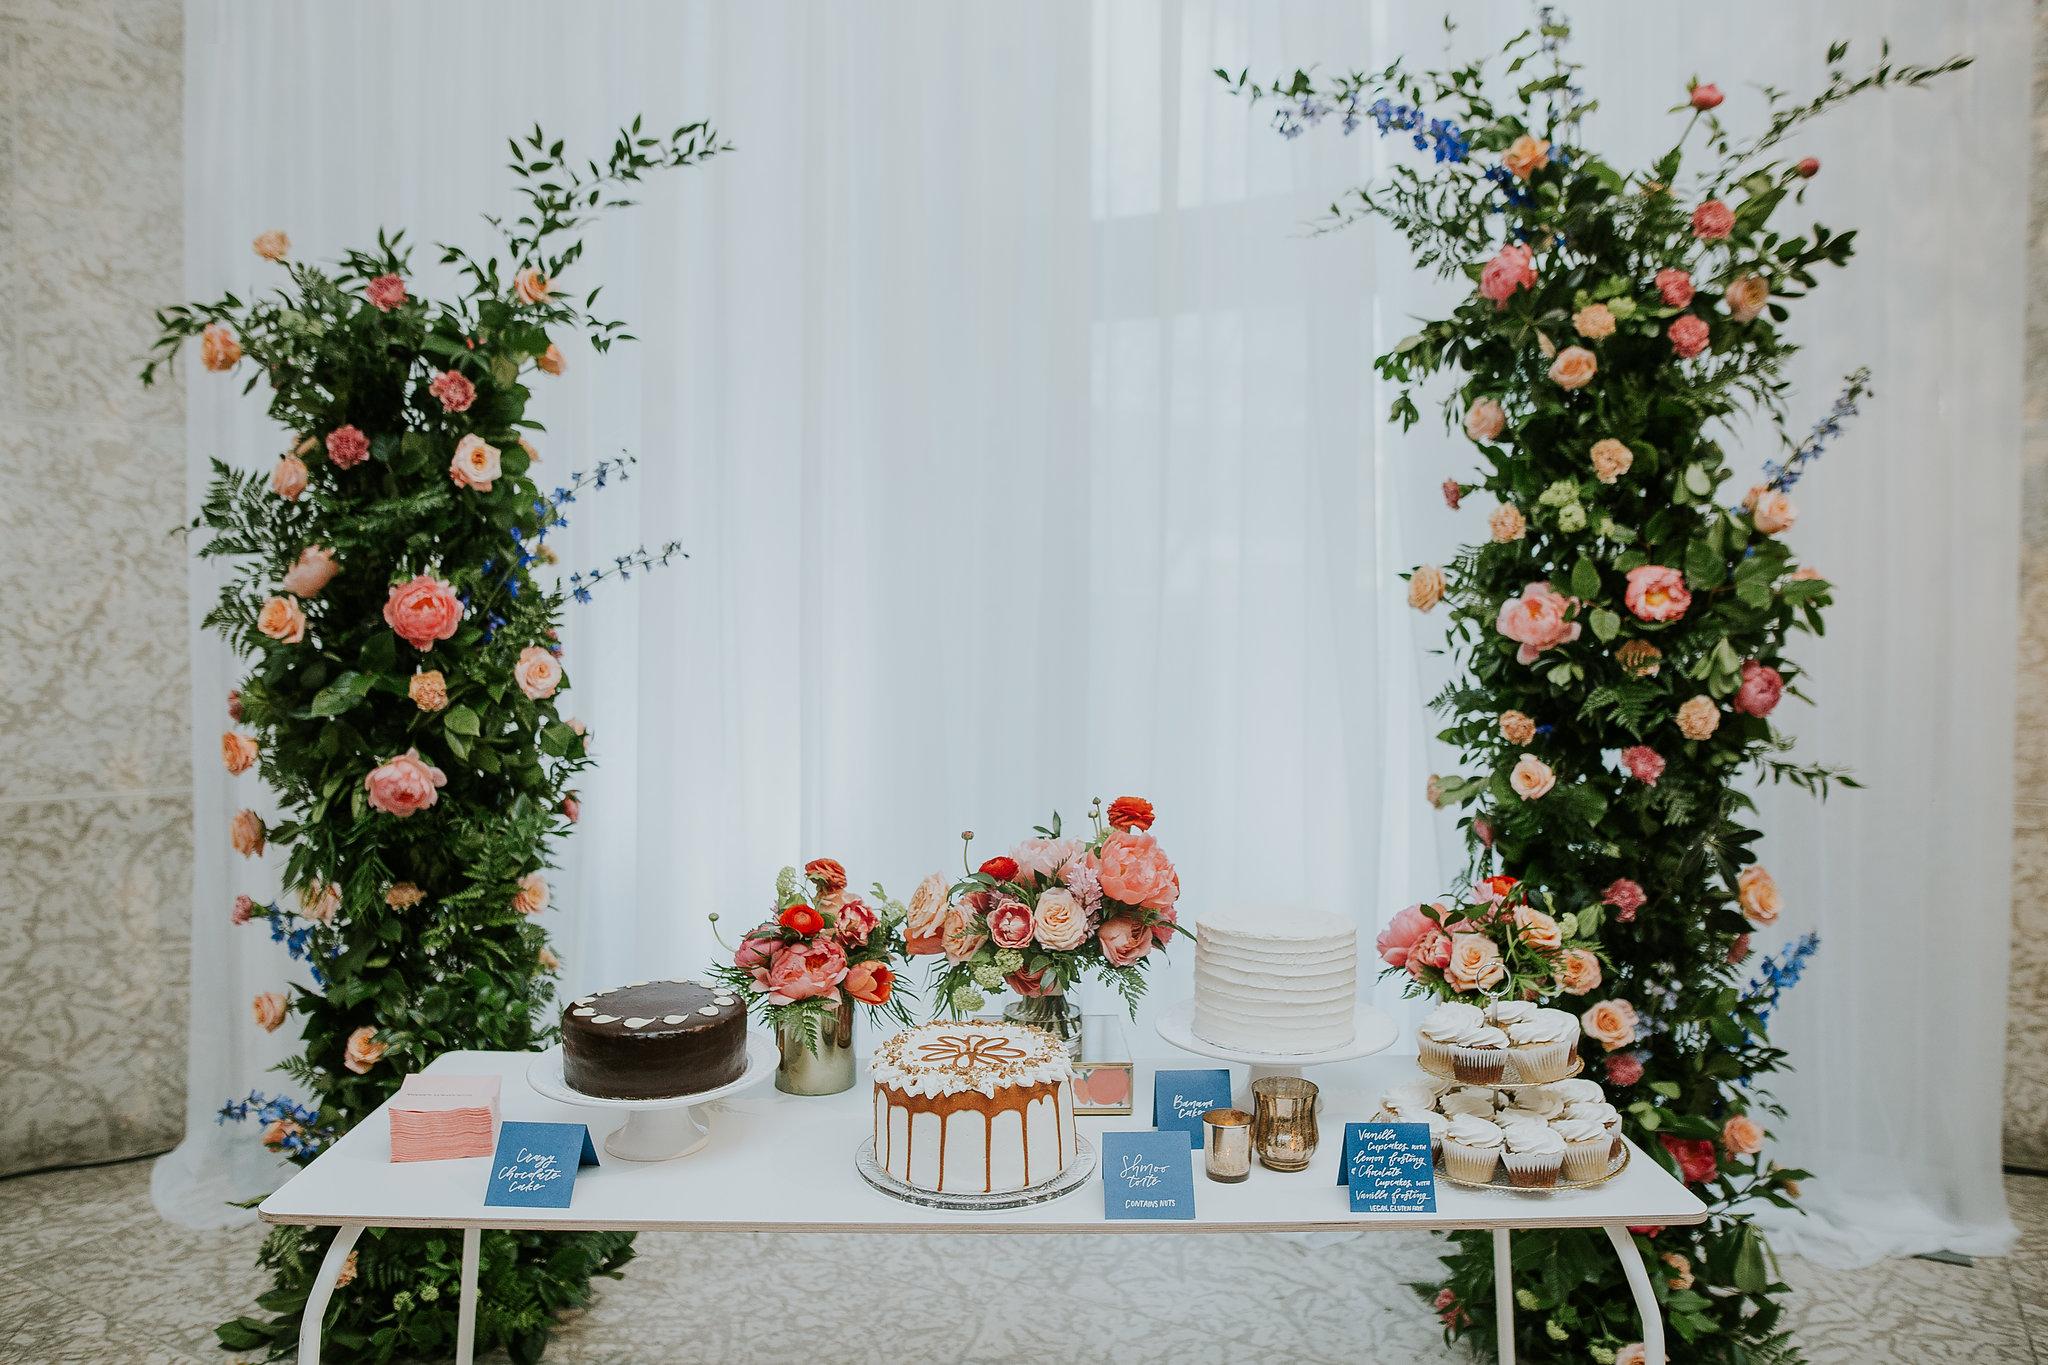 Floral Wedding Cake Display - Wedding Florist in Winnipeg